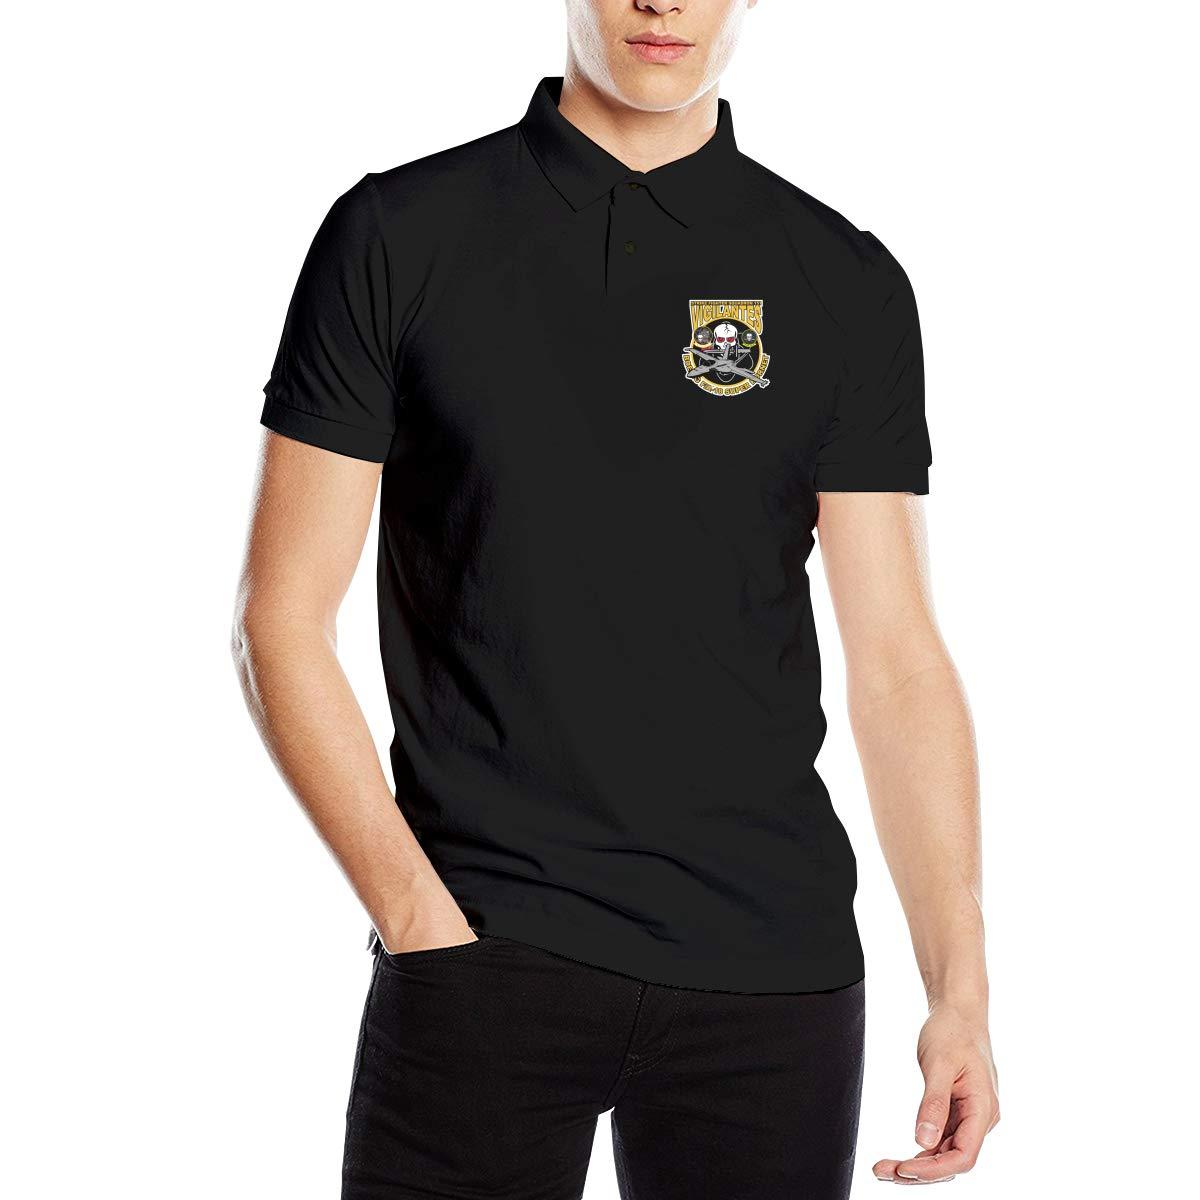 You Know And Good VFA-151 Vigilantes Mens Regular-Fit Cotton Polo Shirt Short Sleeve